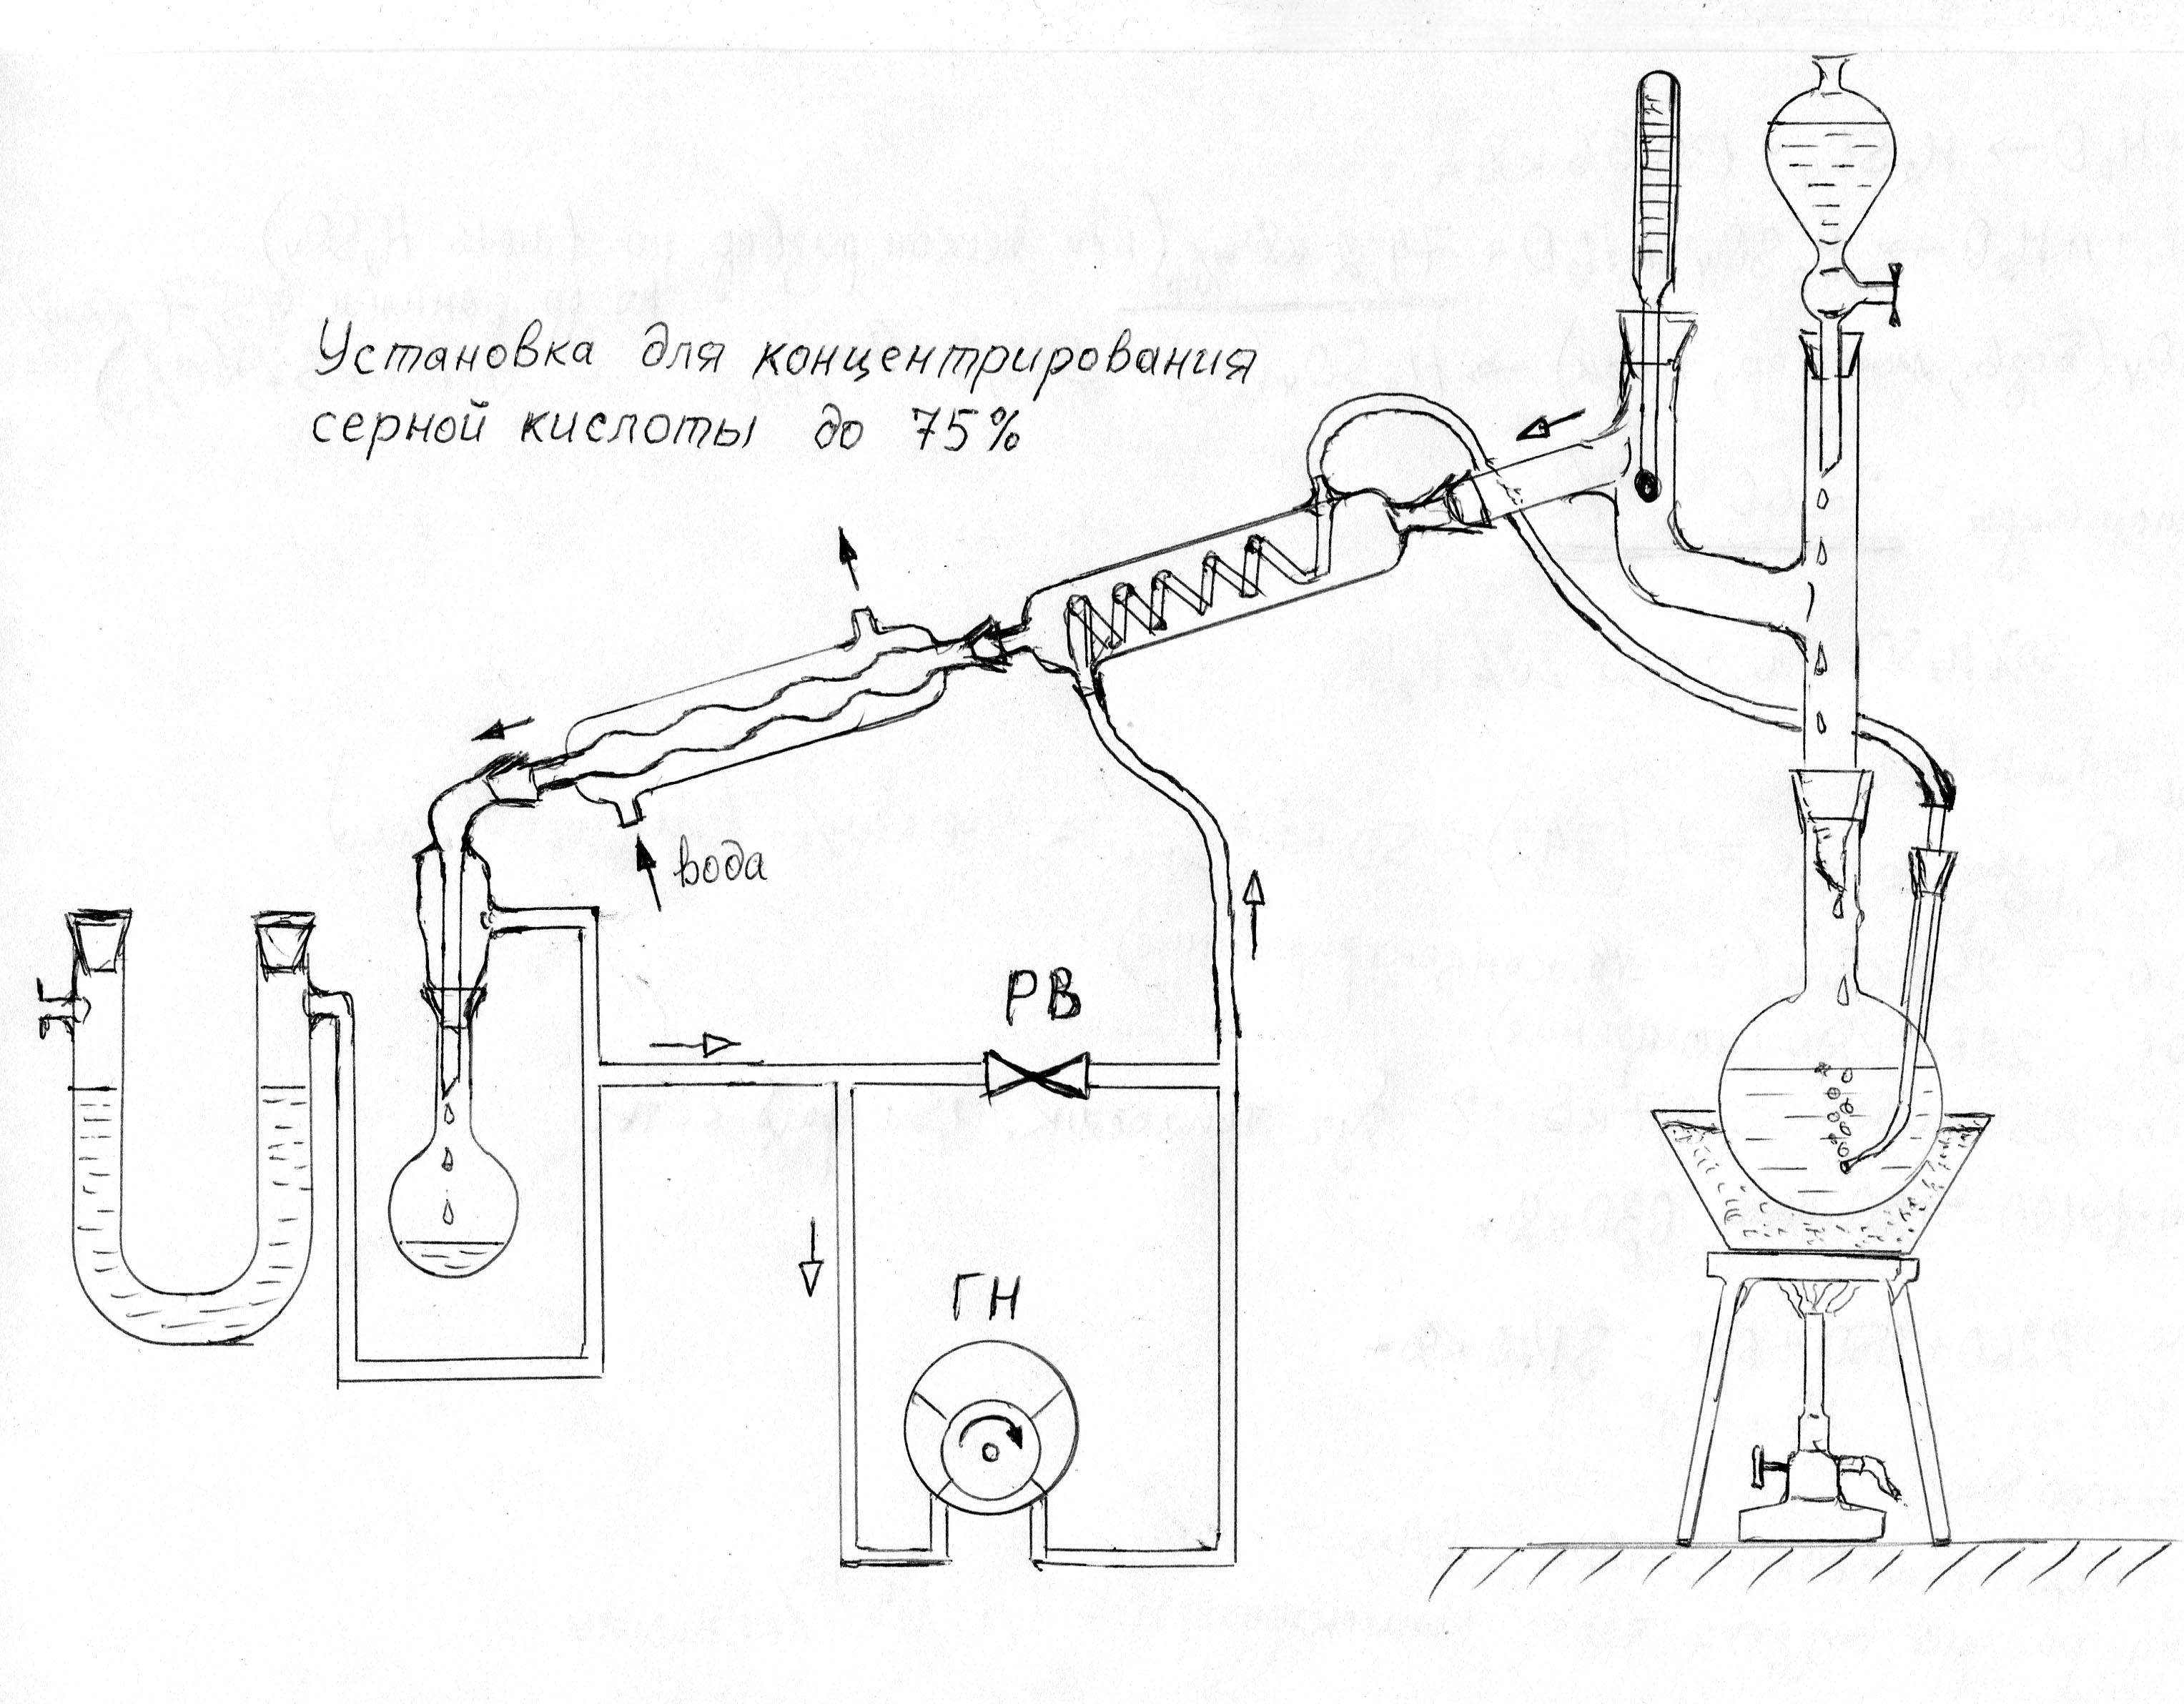 амкнутая (циркуляционная) установка для концентрирования